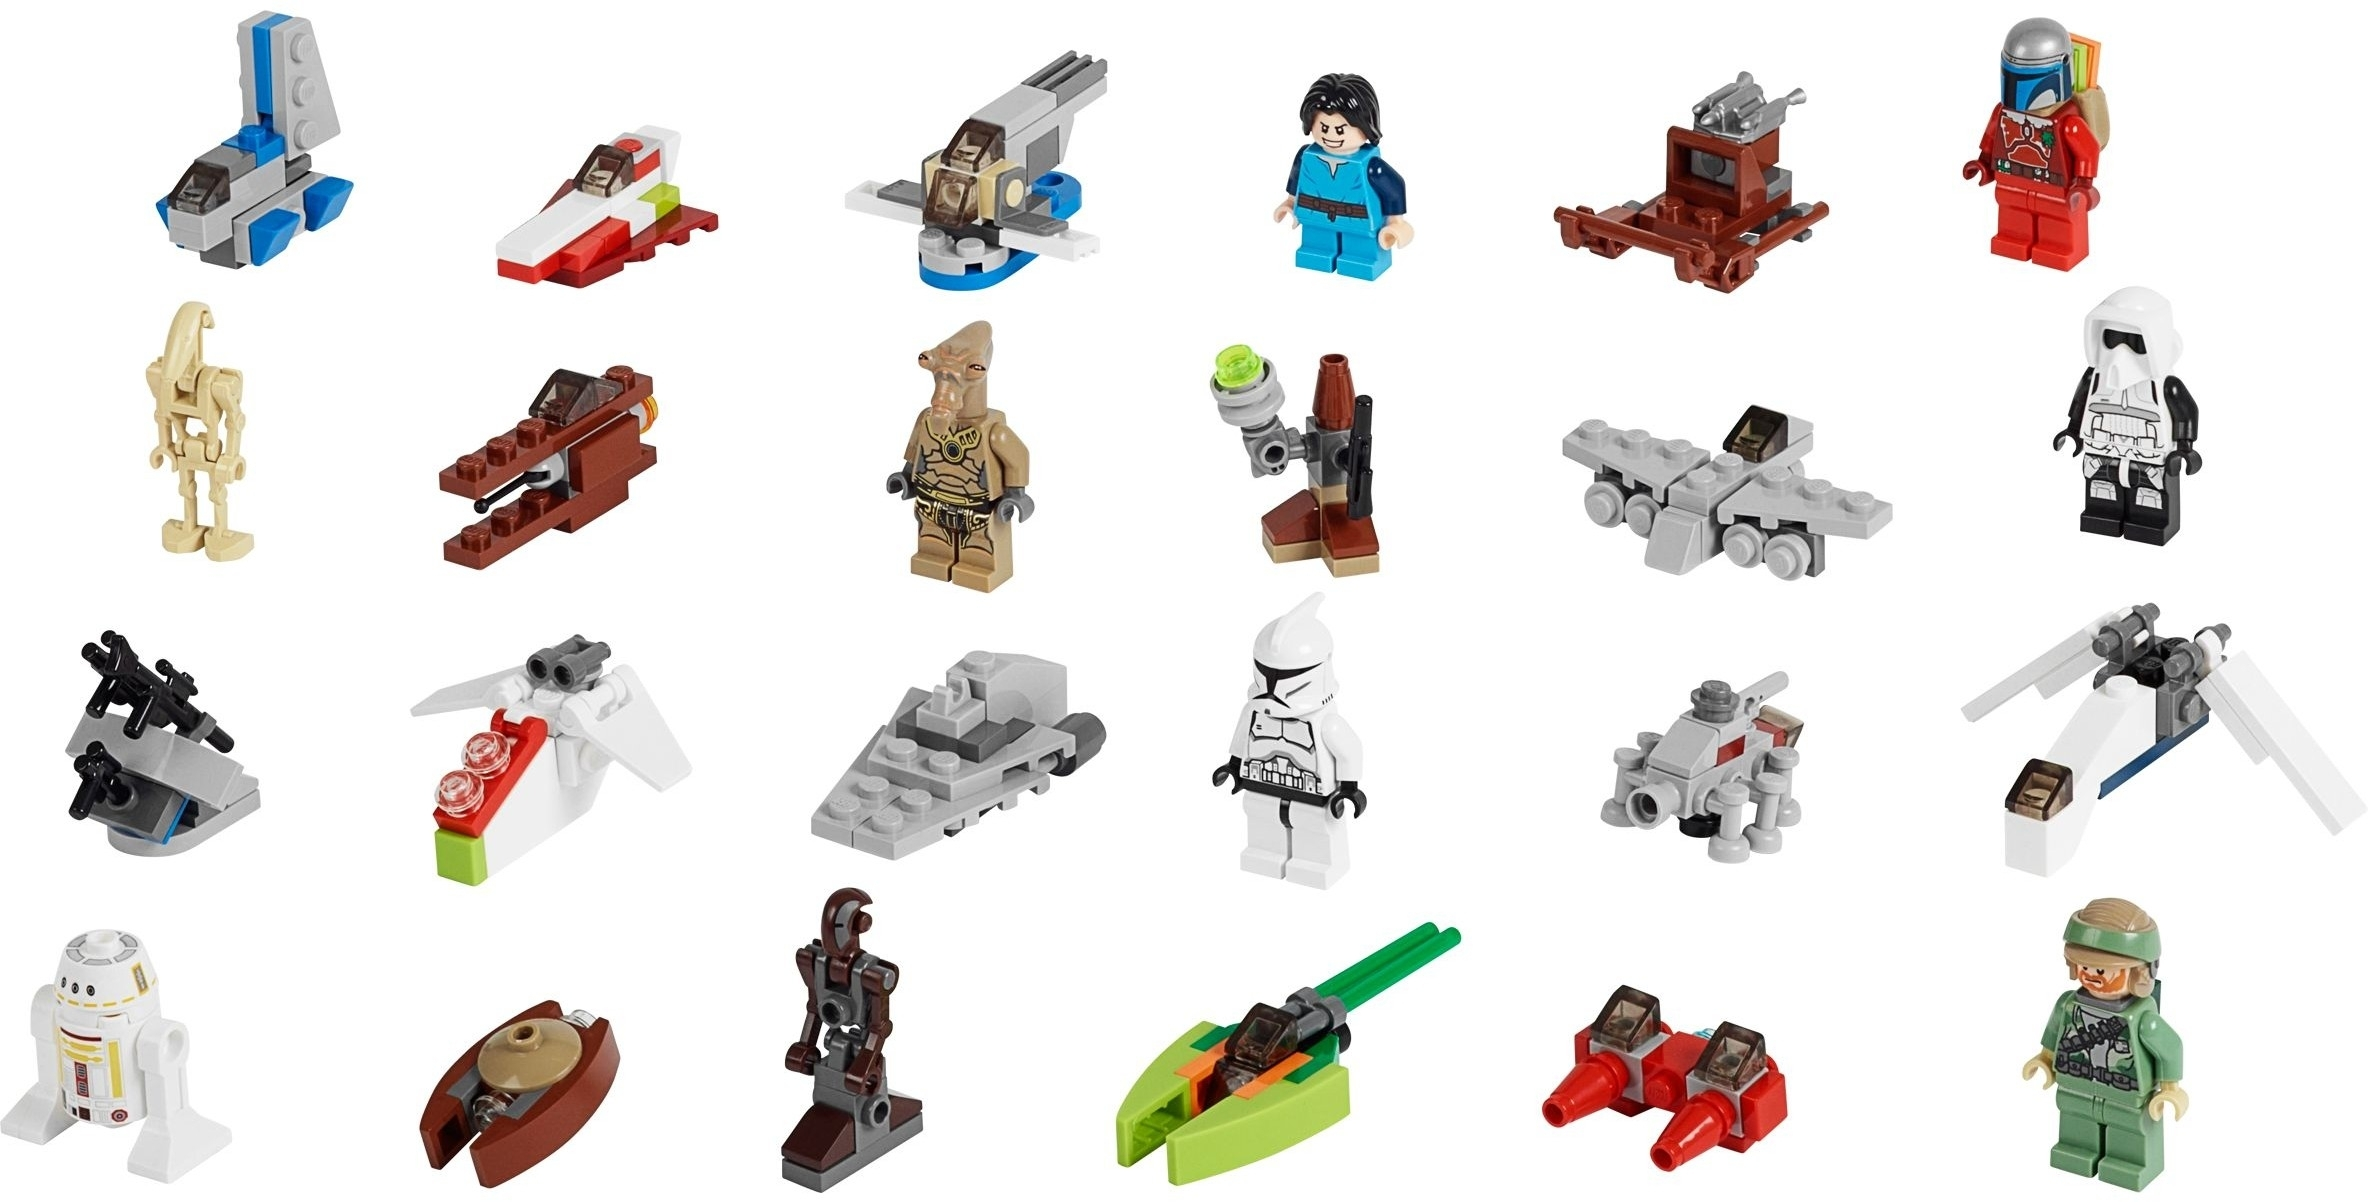 Lego 75023 Star Wars Advent Calendar Instructions, Star Wars within Are There Instructions For The Lego Star Wars Advent Calendar